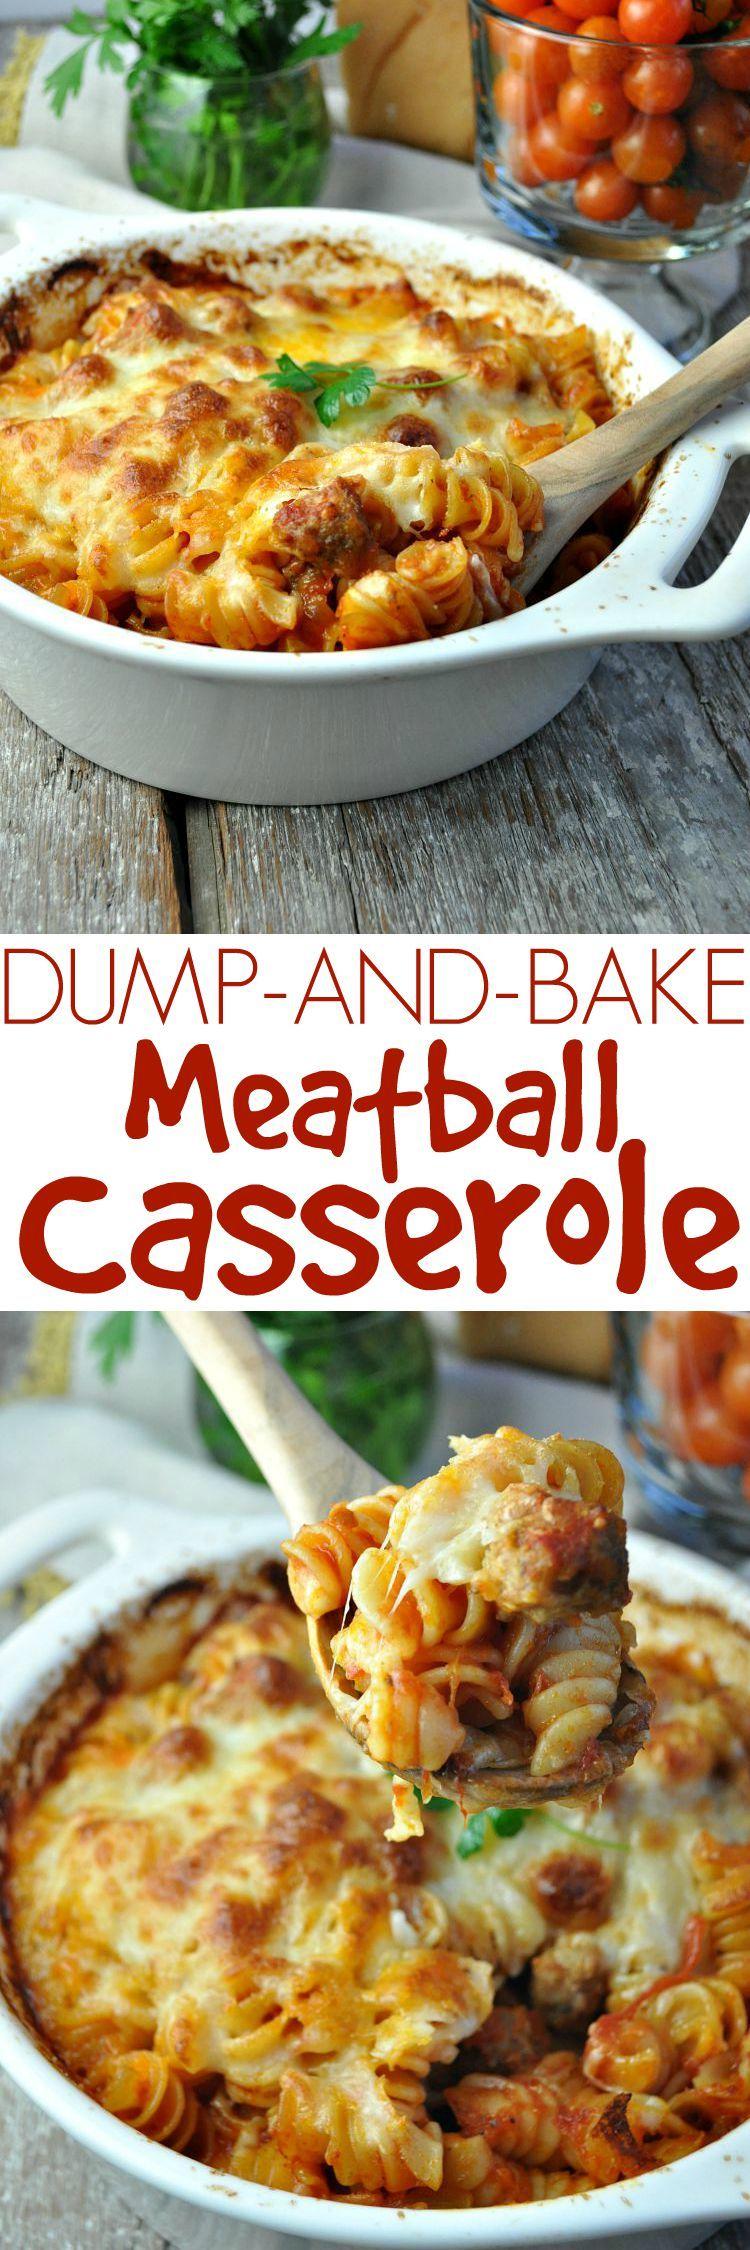 Easy casserole recipes for family